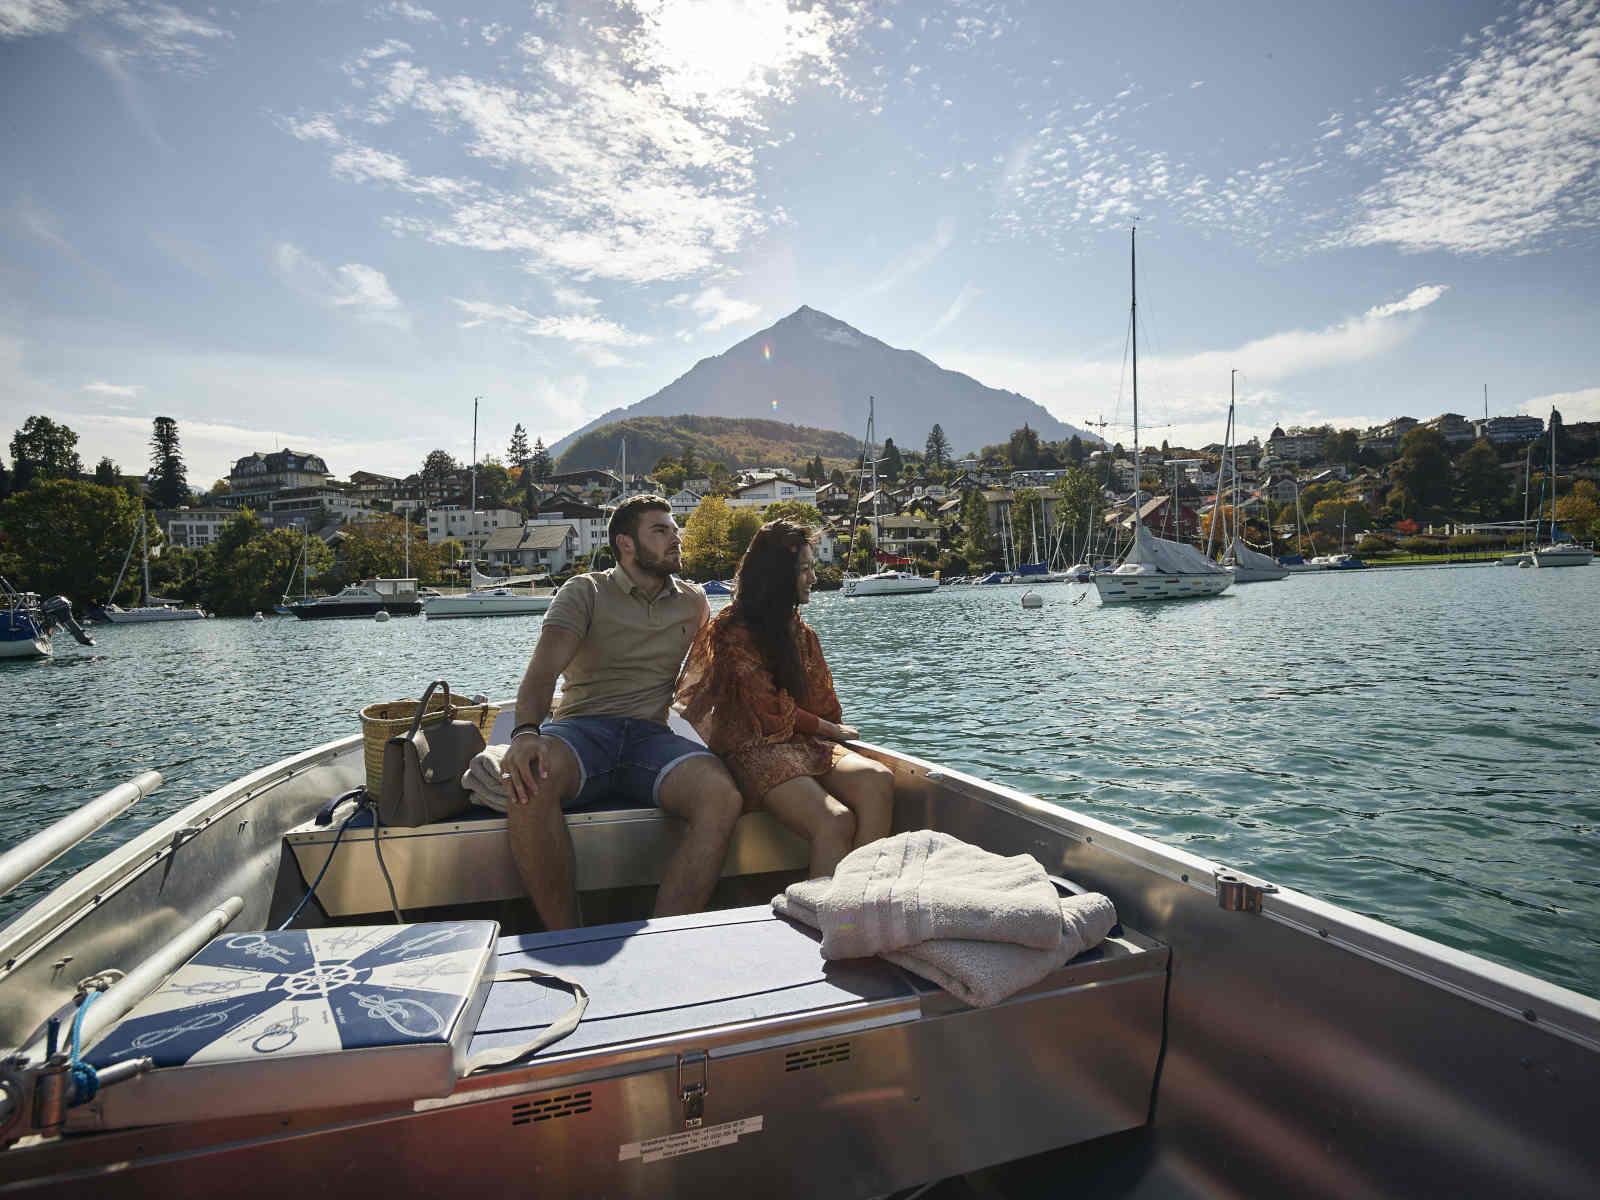 Pärchen im Boot